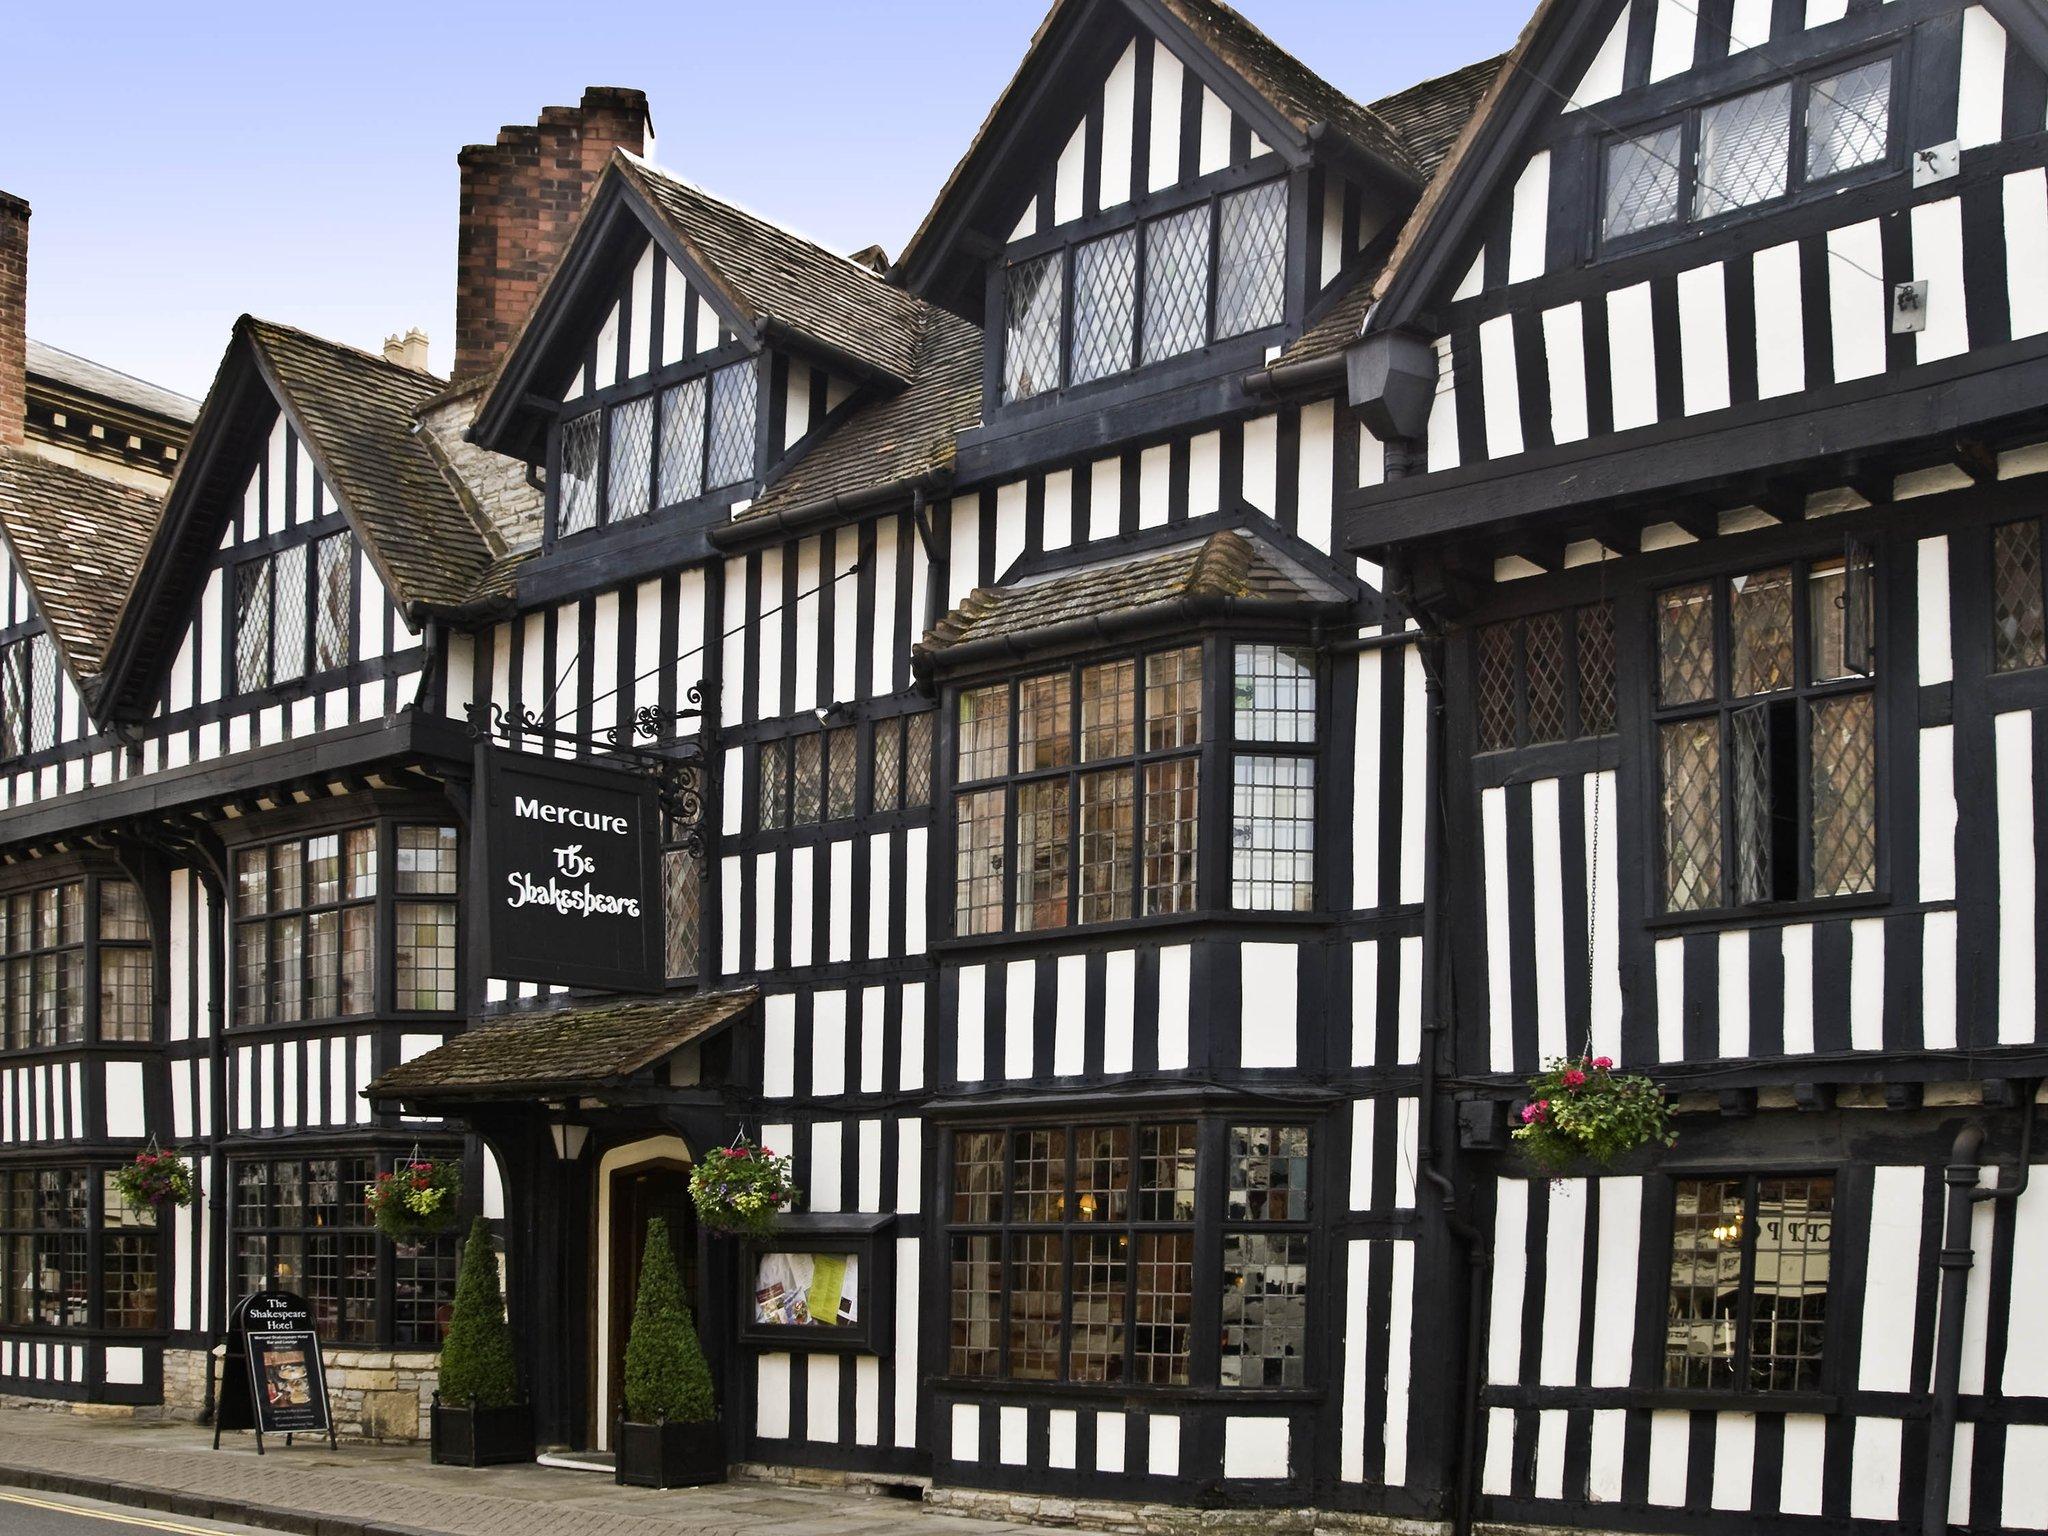 Mercure Stratford-upon-Avon Shakespeare